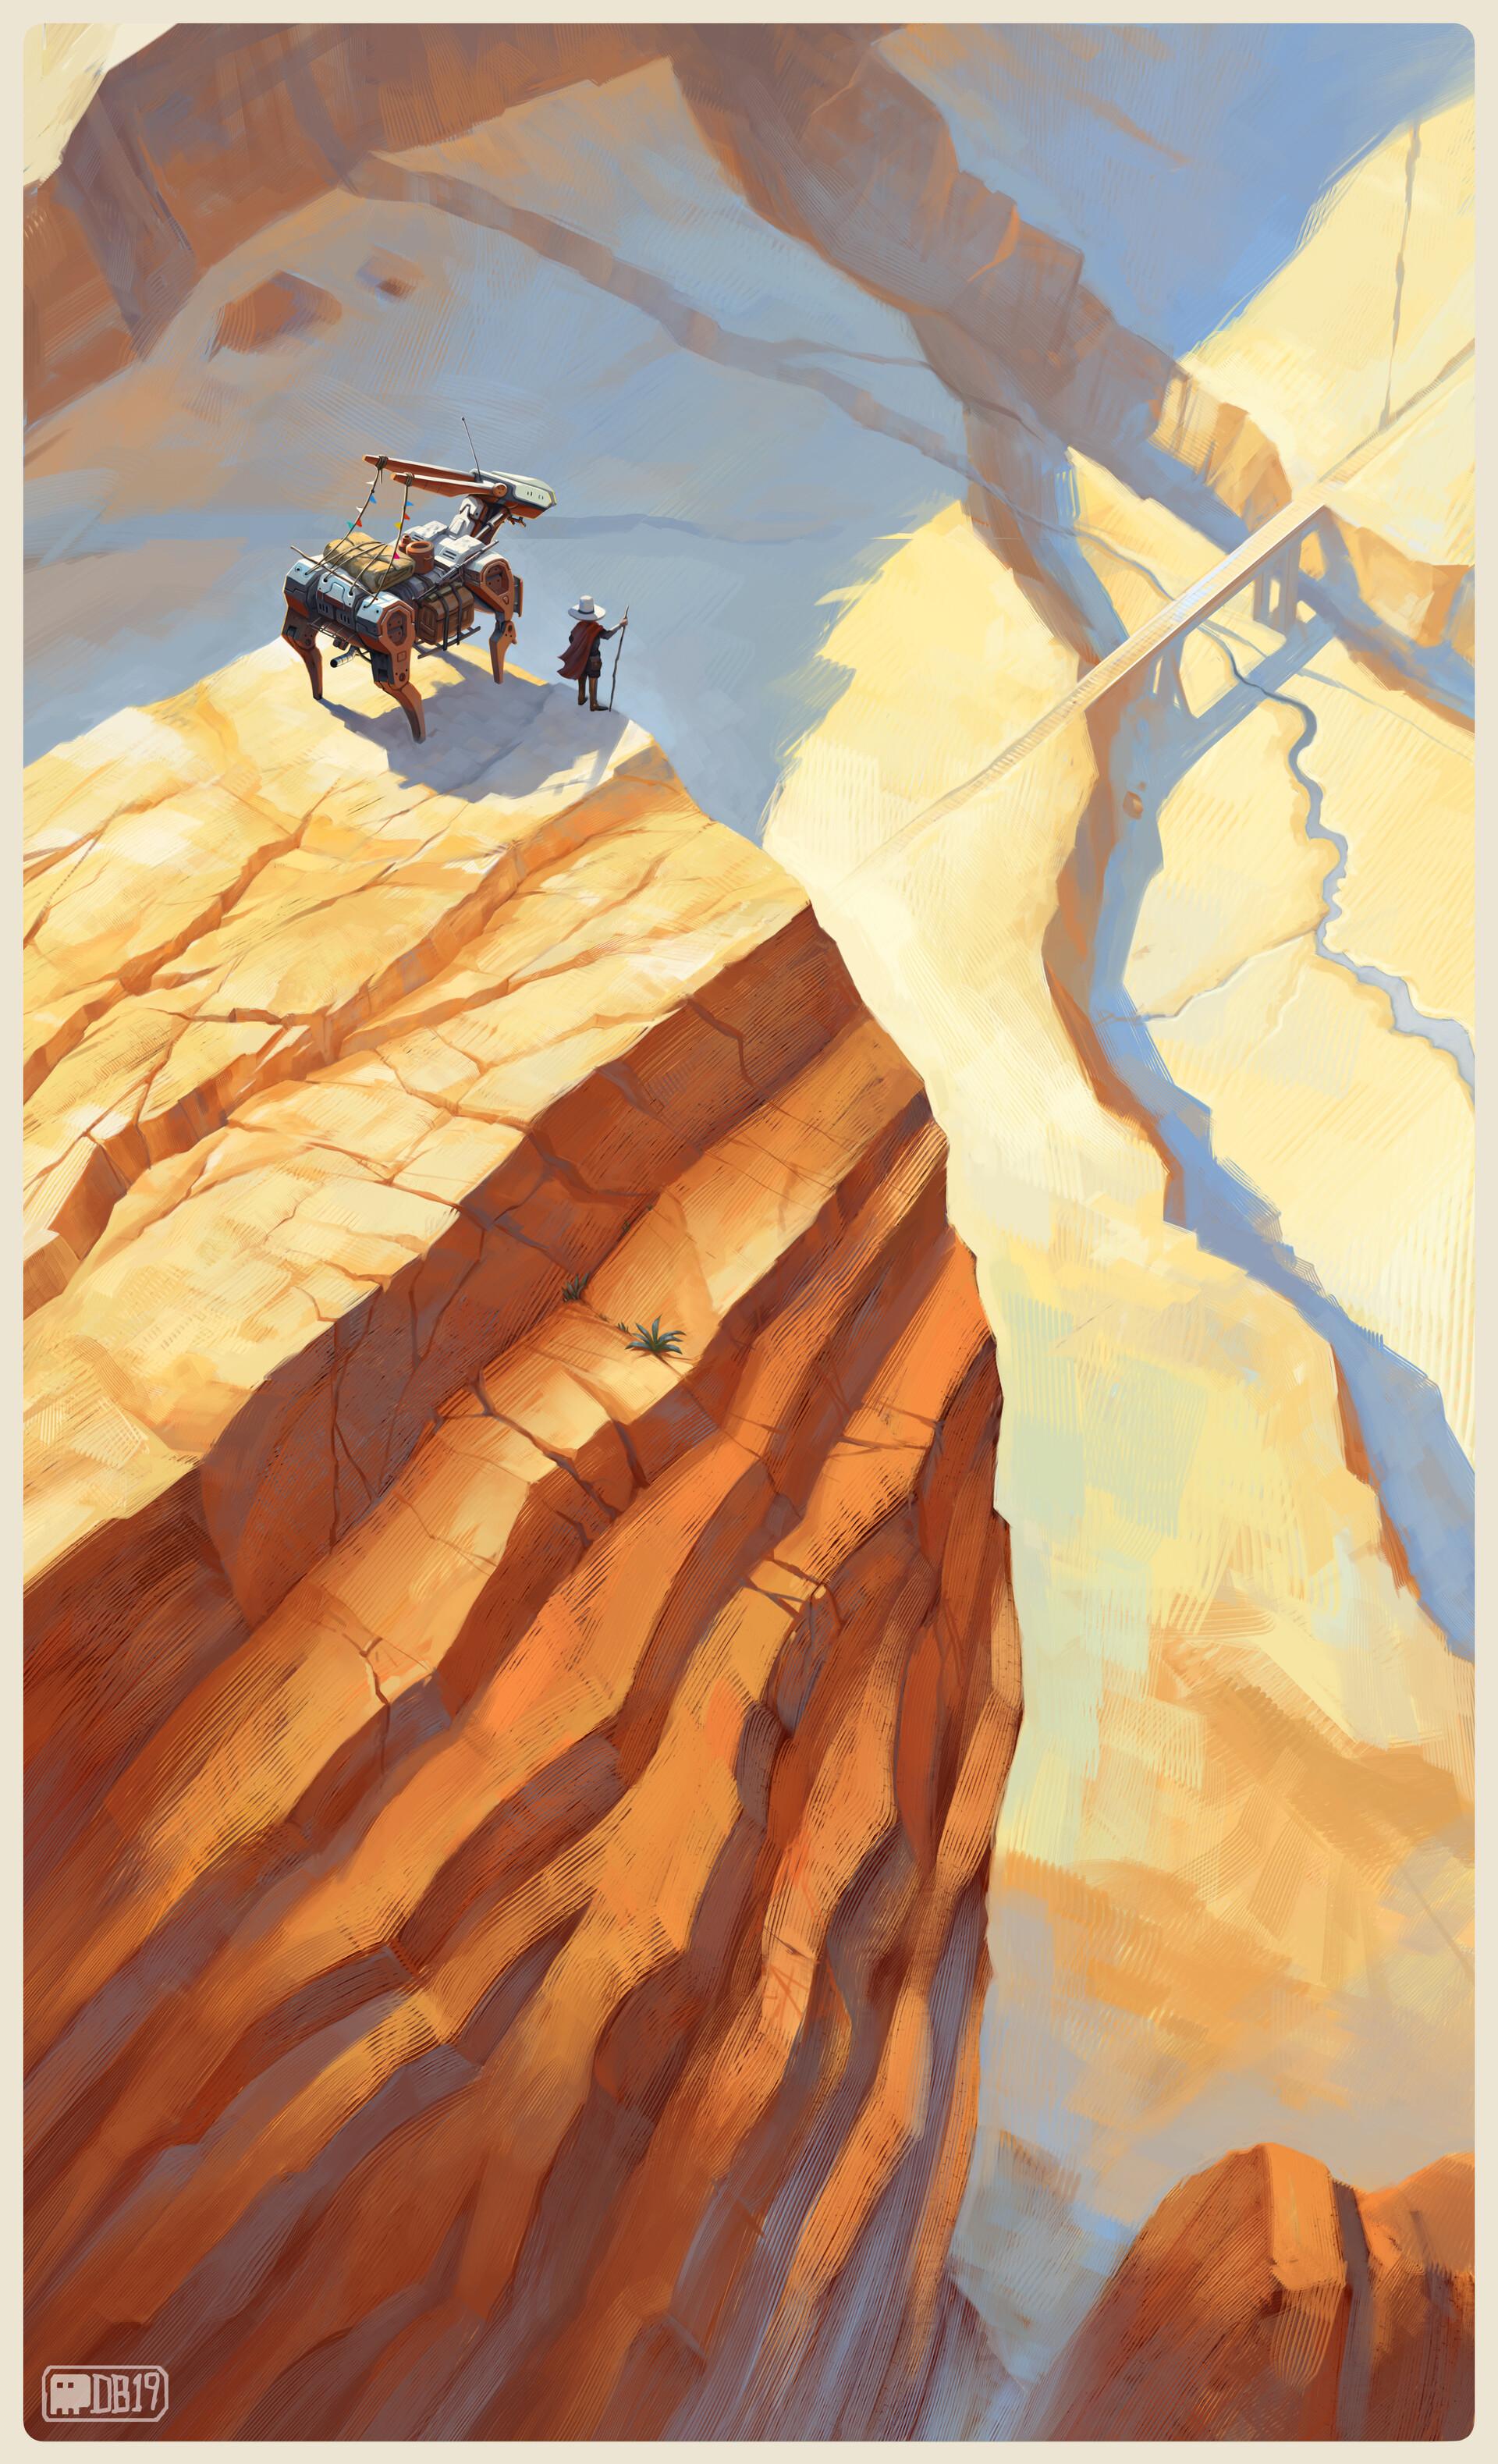 Daniel bayona cliff copy